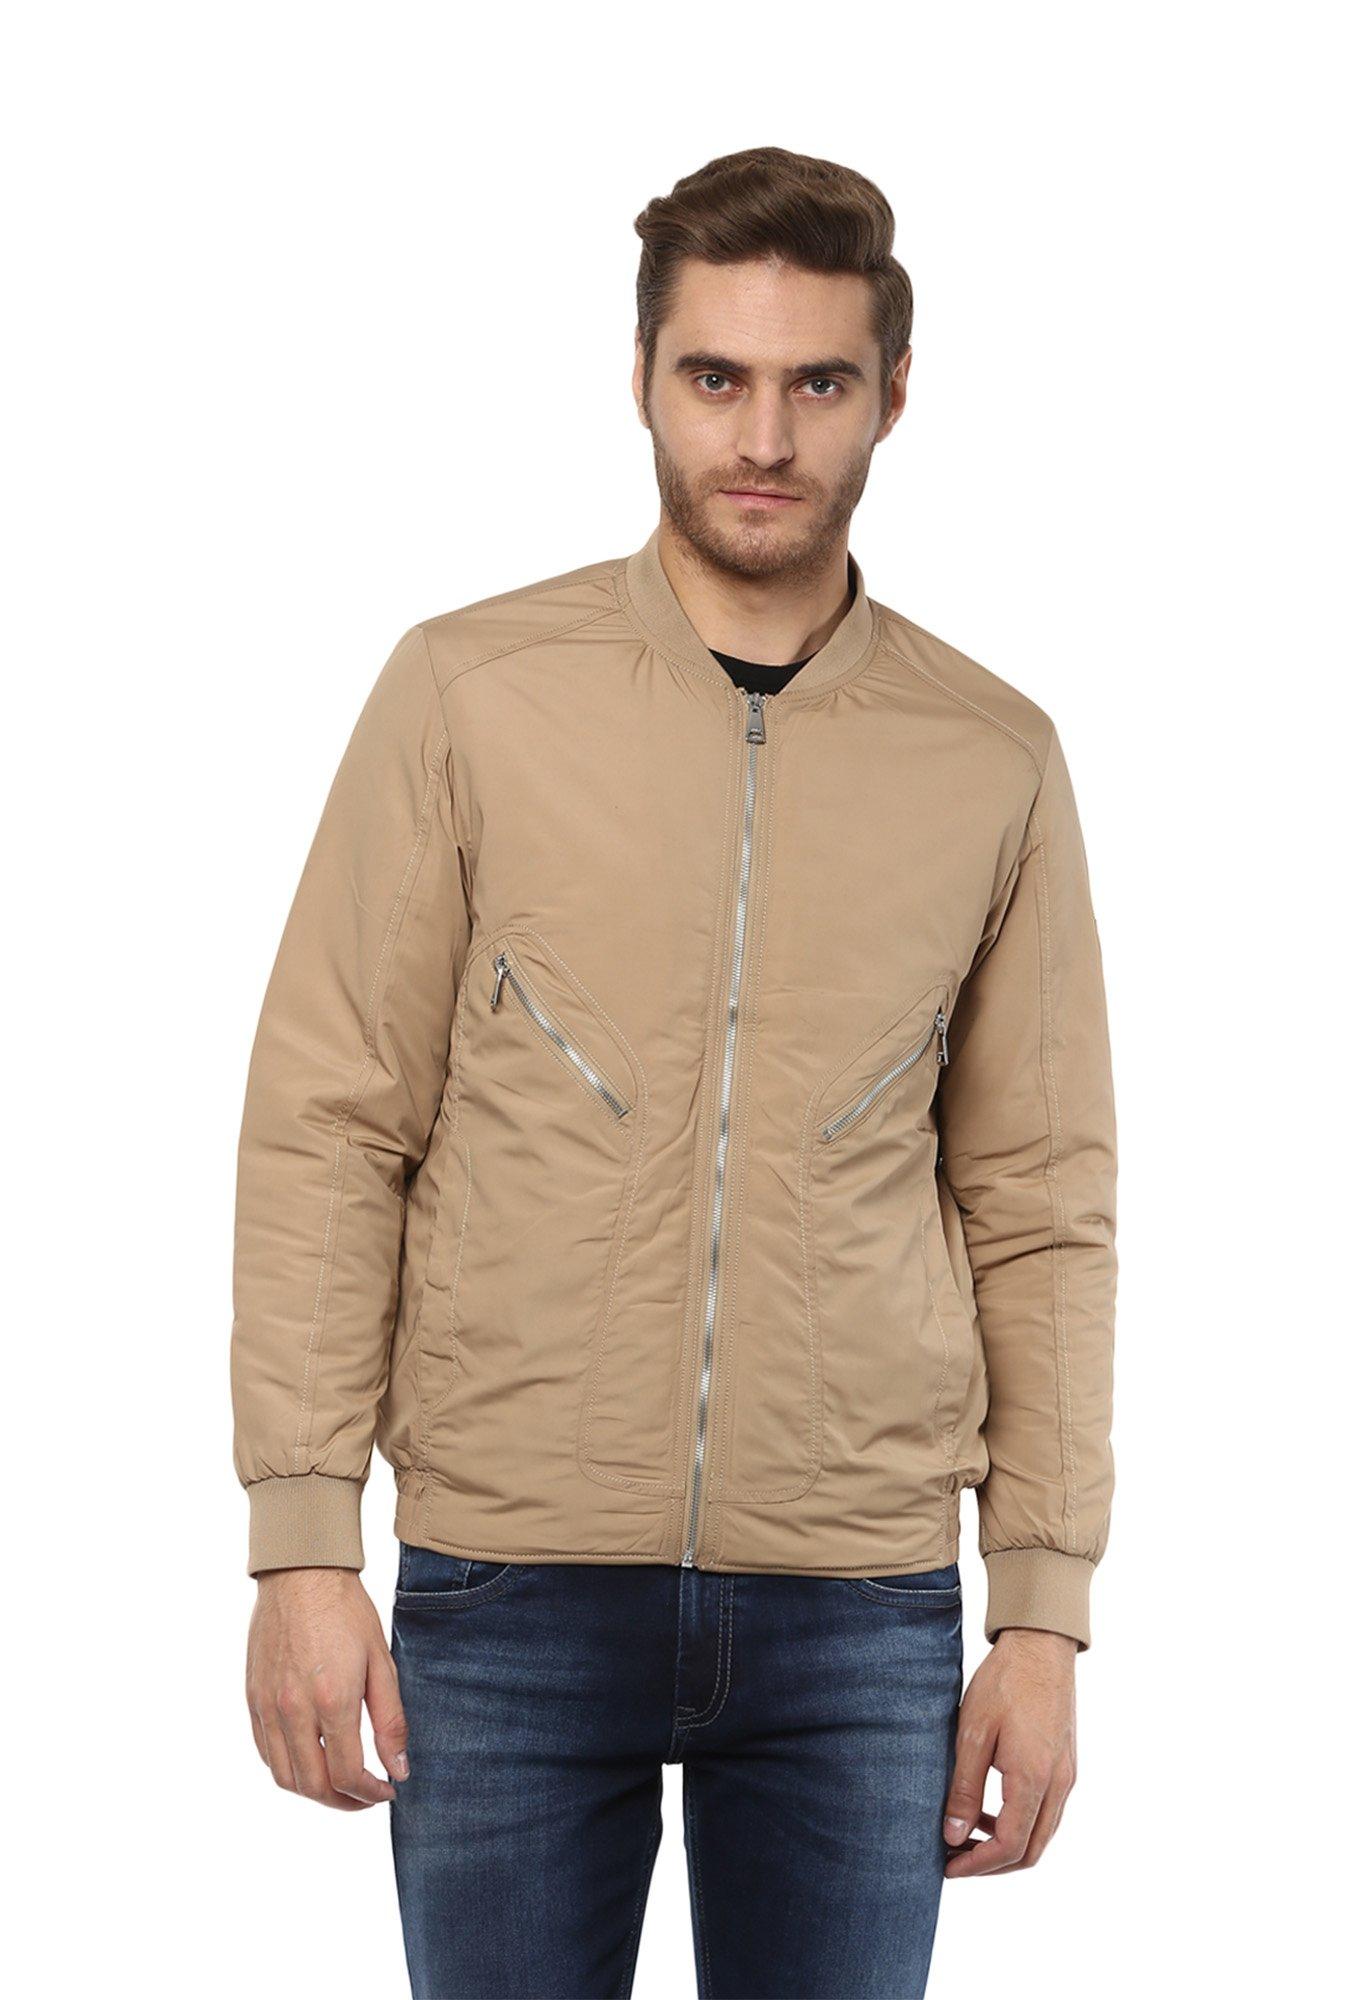 879539bf0 Buy Mufti Khaki Slim Fit Bomber Jacket for Men Online @ Tata CLiQ